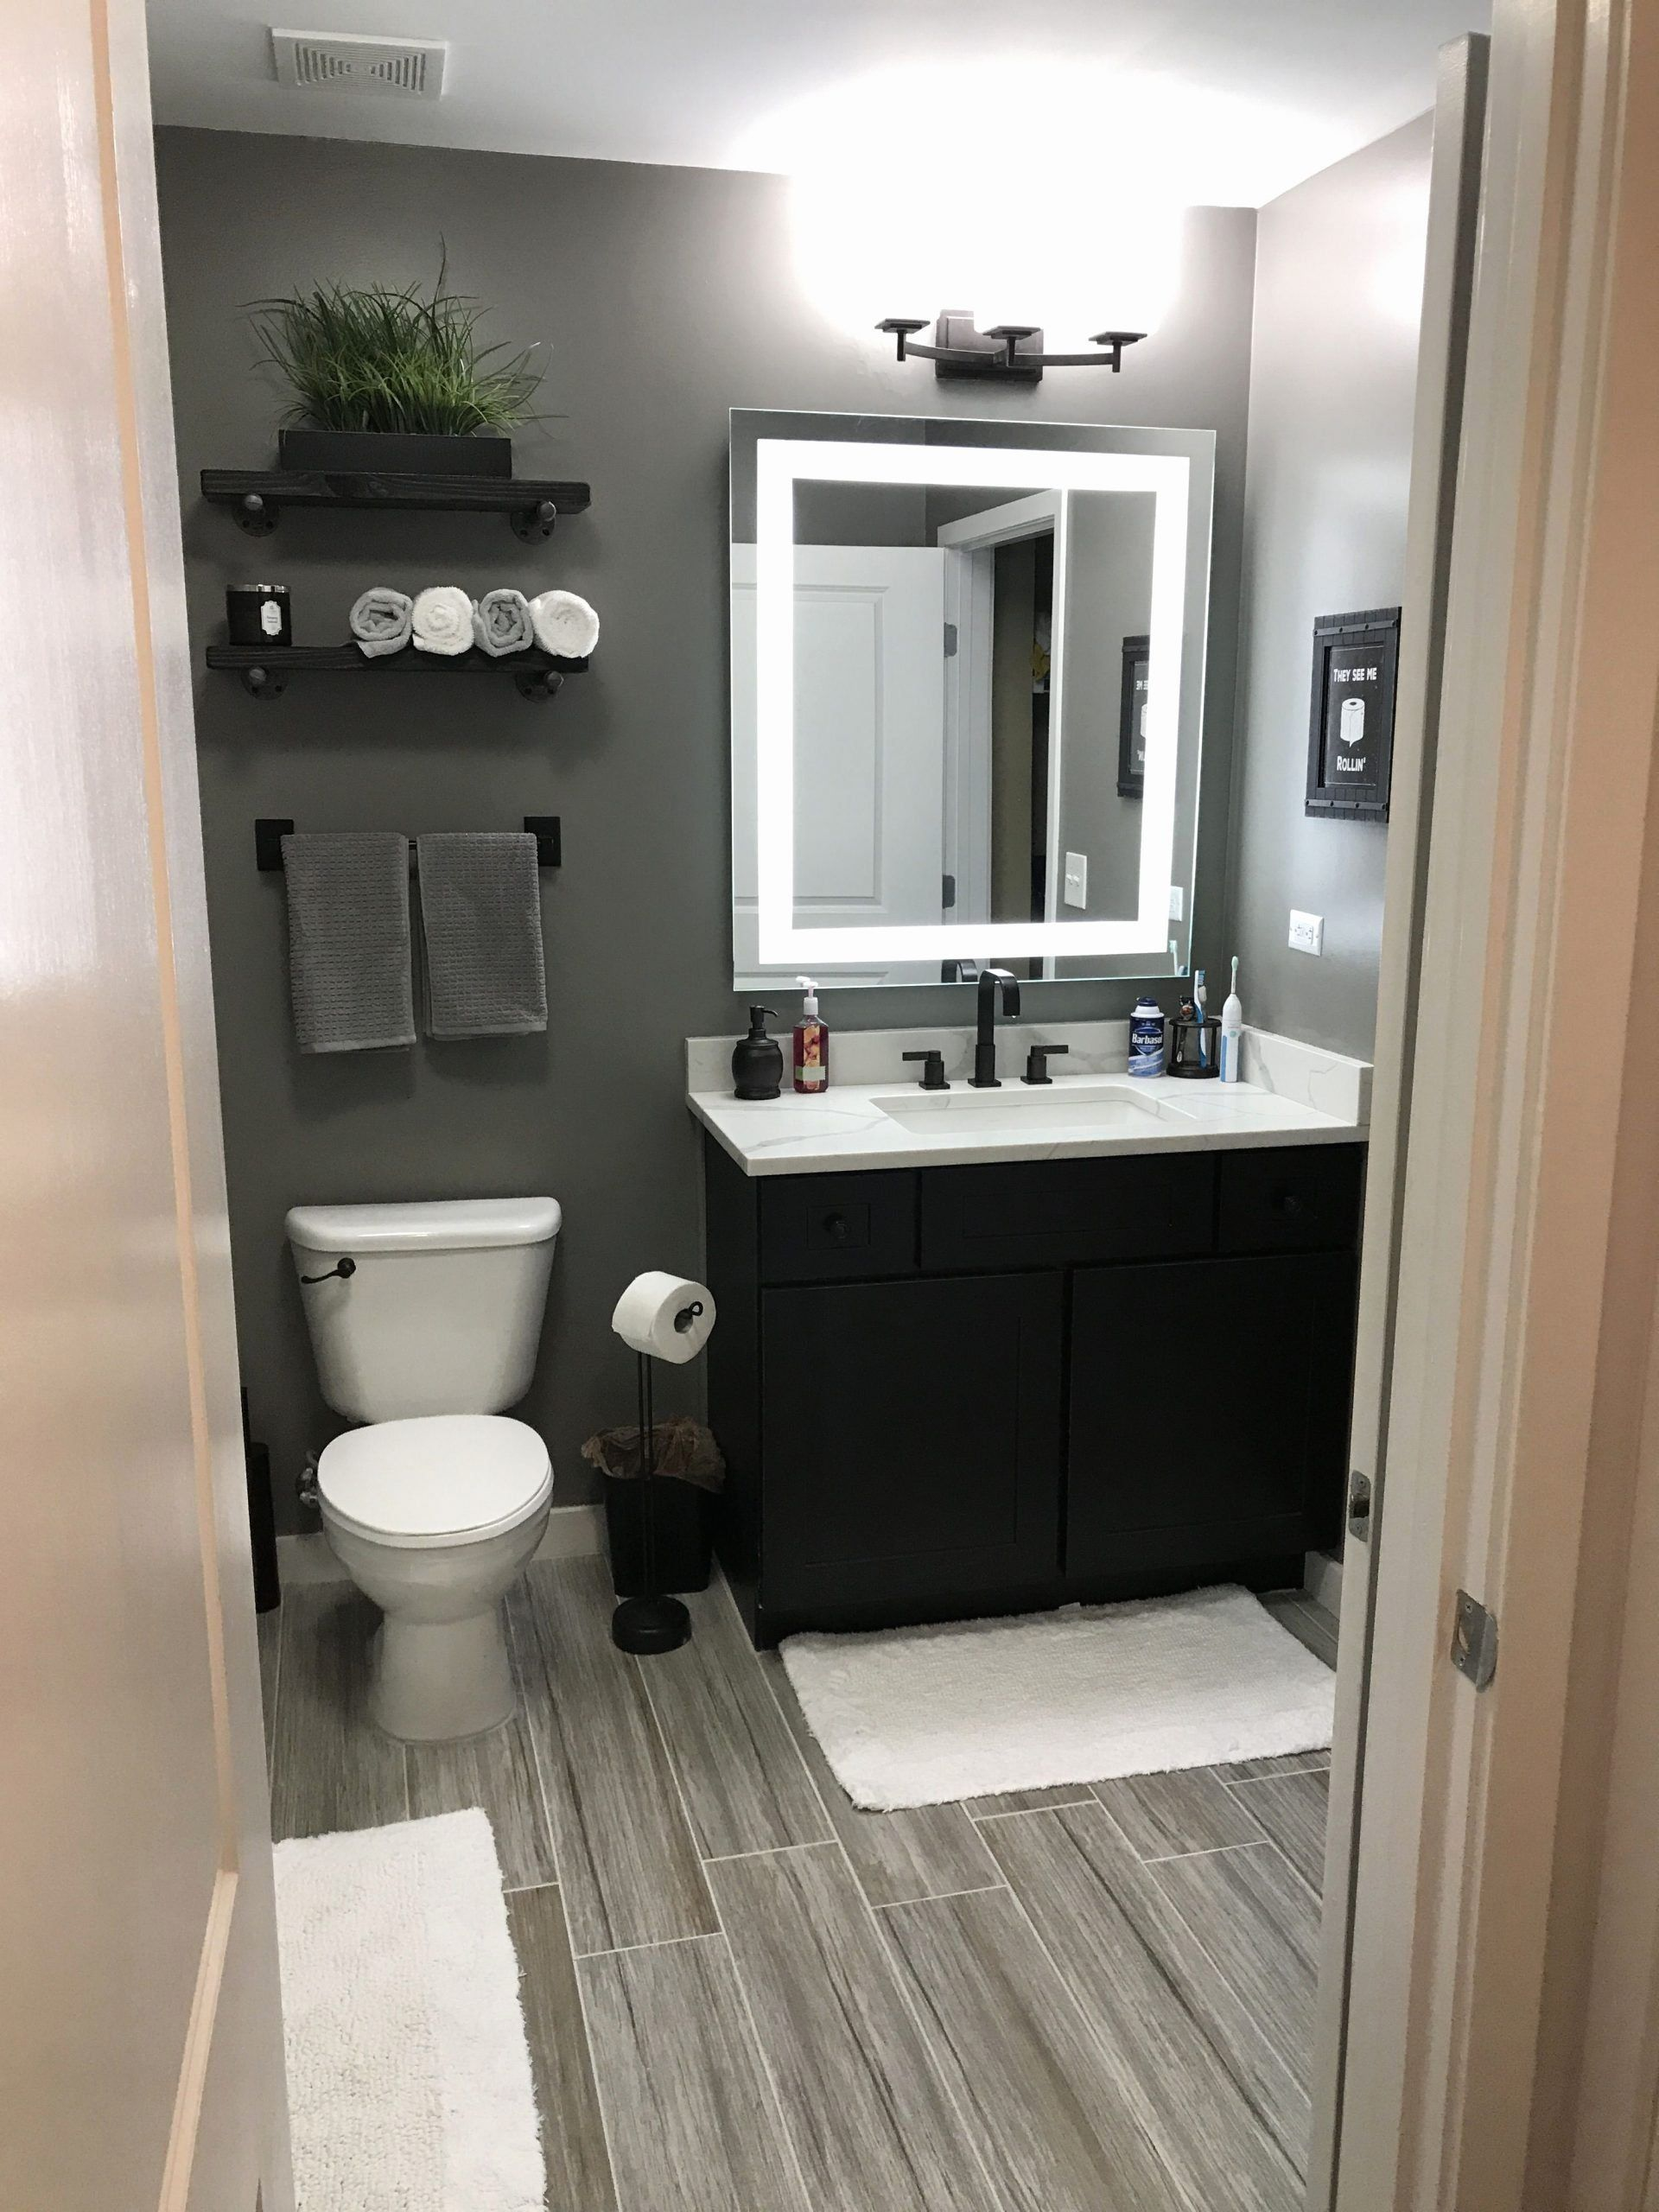 Mens Bathroom Ideas Inspirational Grey Bathroom Men S Bathroom Small Bathroom Wo 1000 In 2020 Small Bathroom Makeover Man Bathroom Bathroom Interior Design